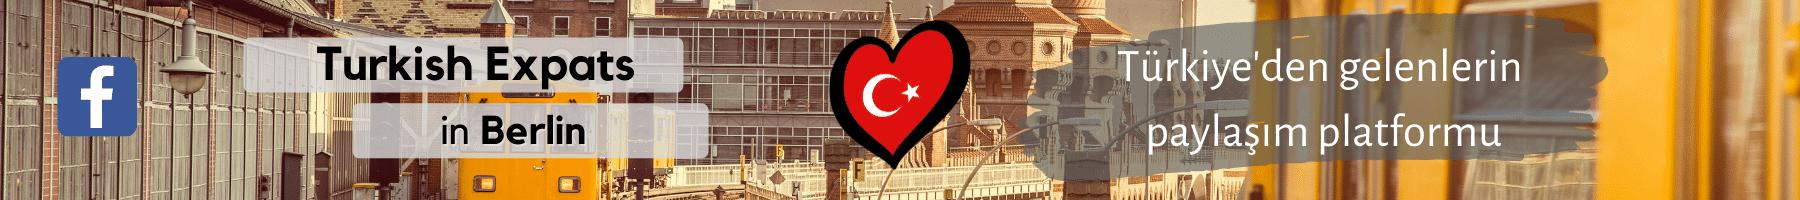 Turkish Expats 2050 x 400 px 2